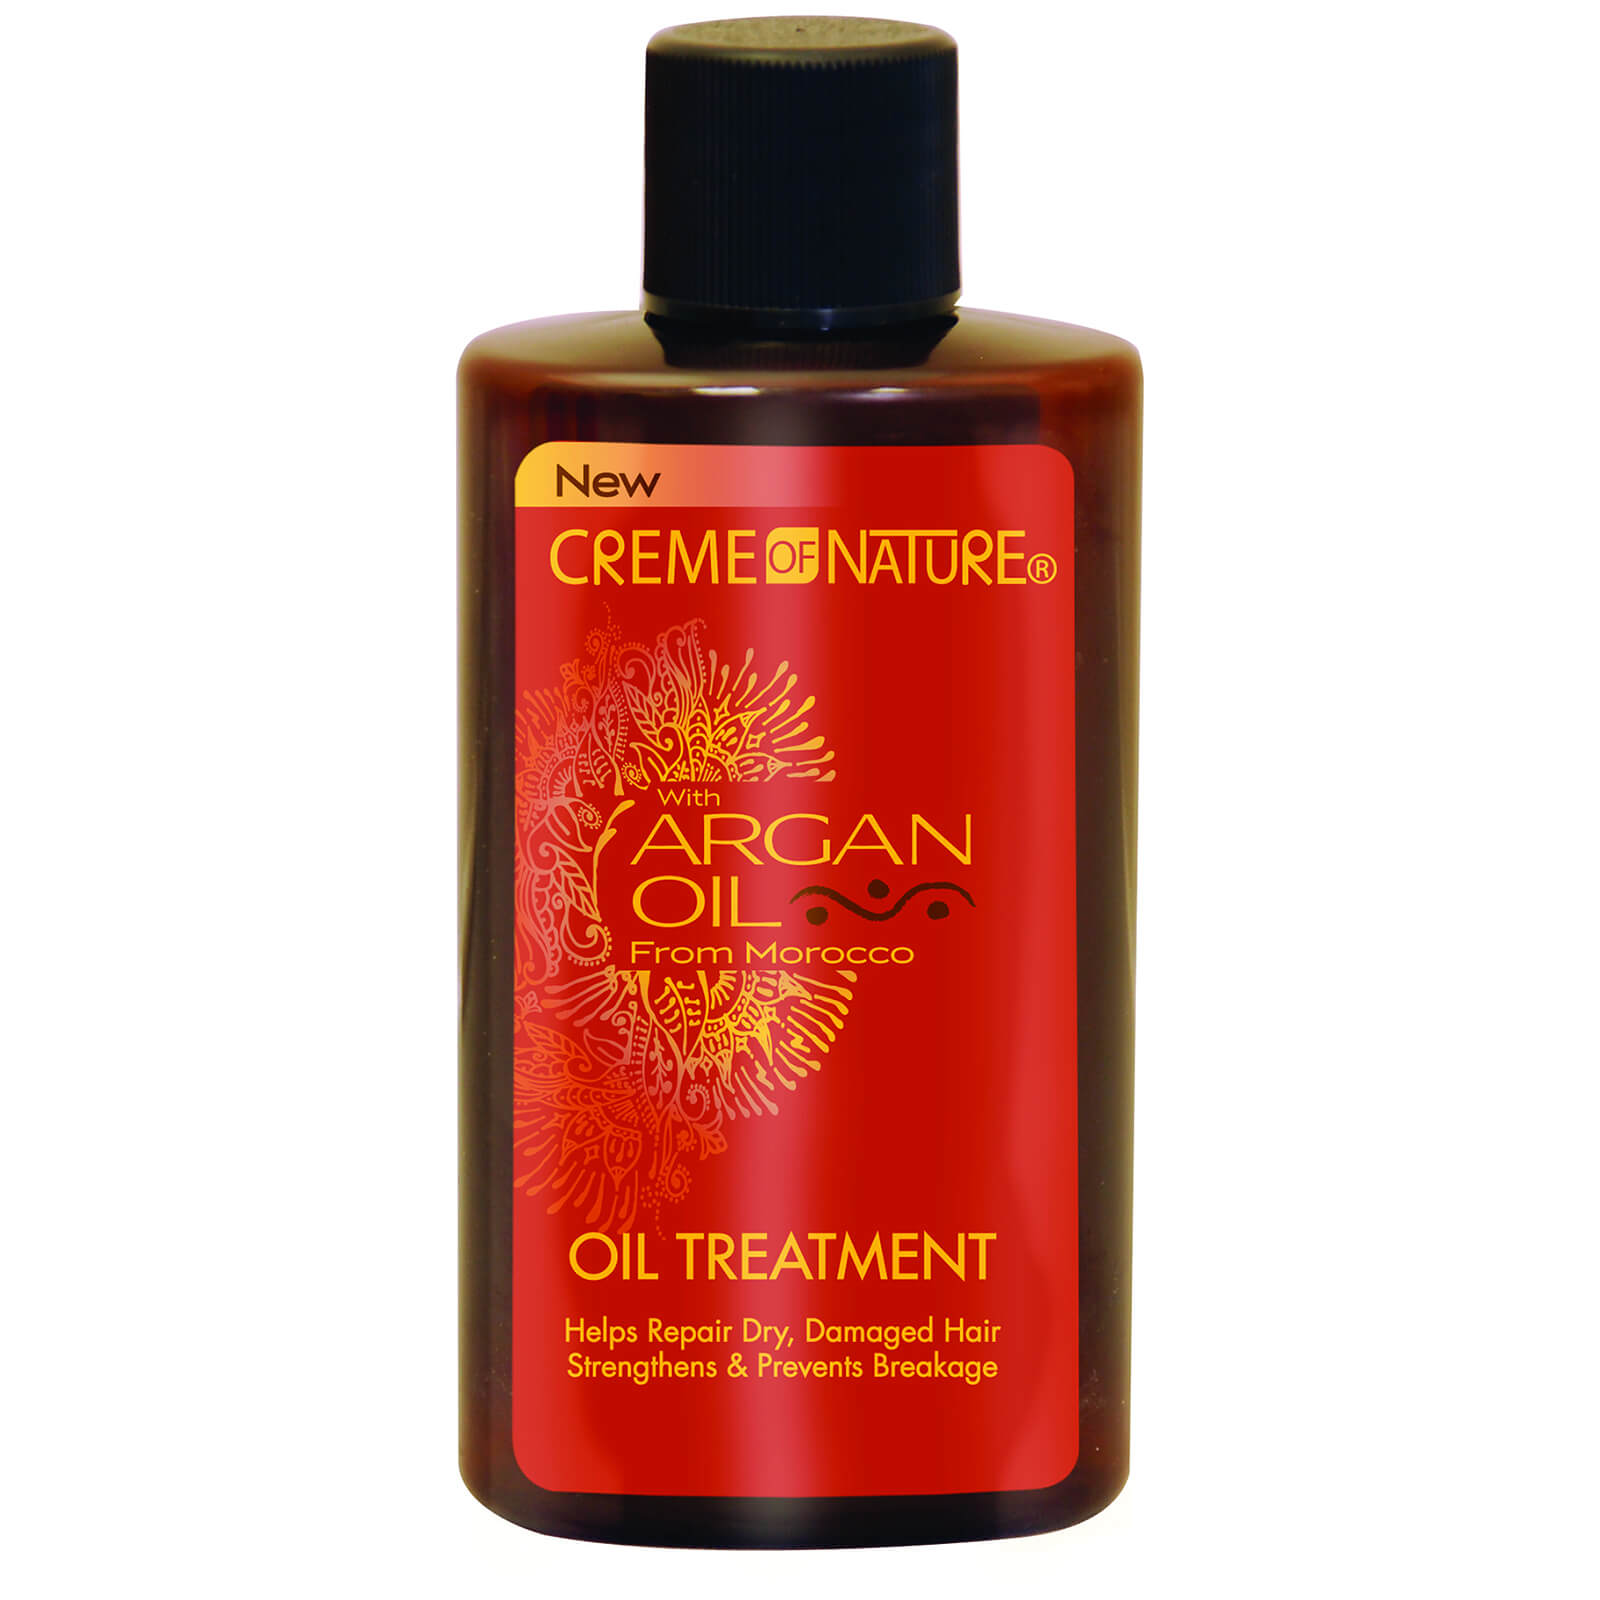 Купить Crème of Nature Argan Oil Treatment 85ml